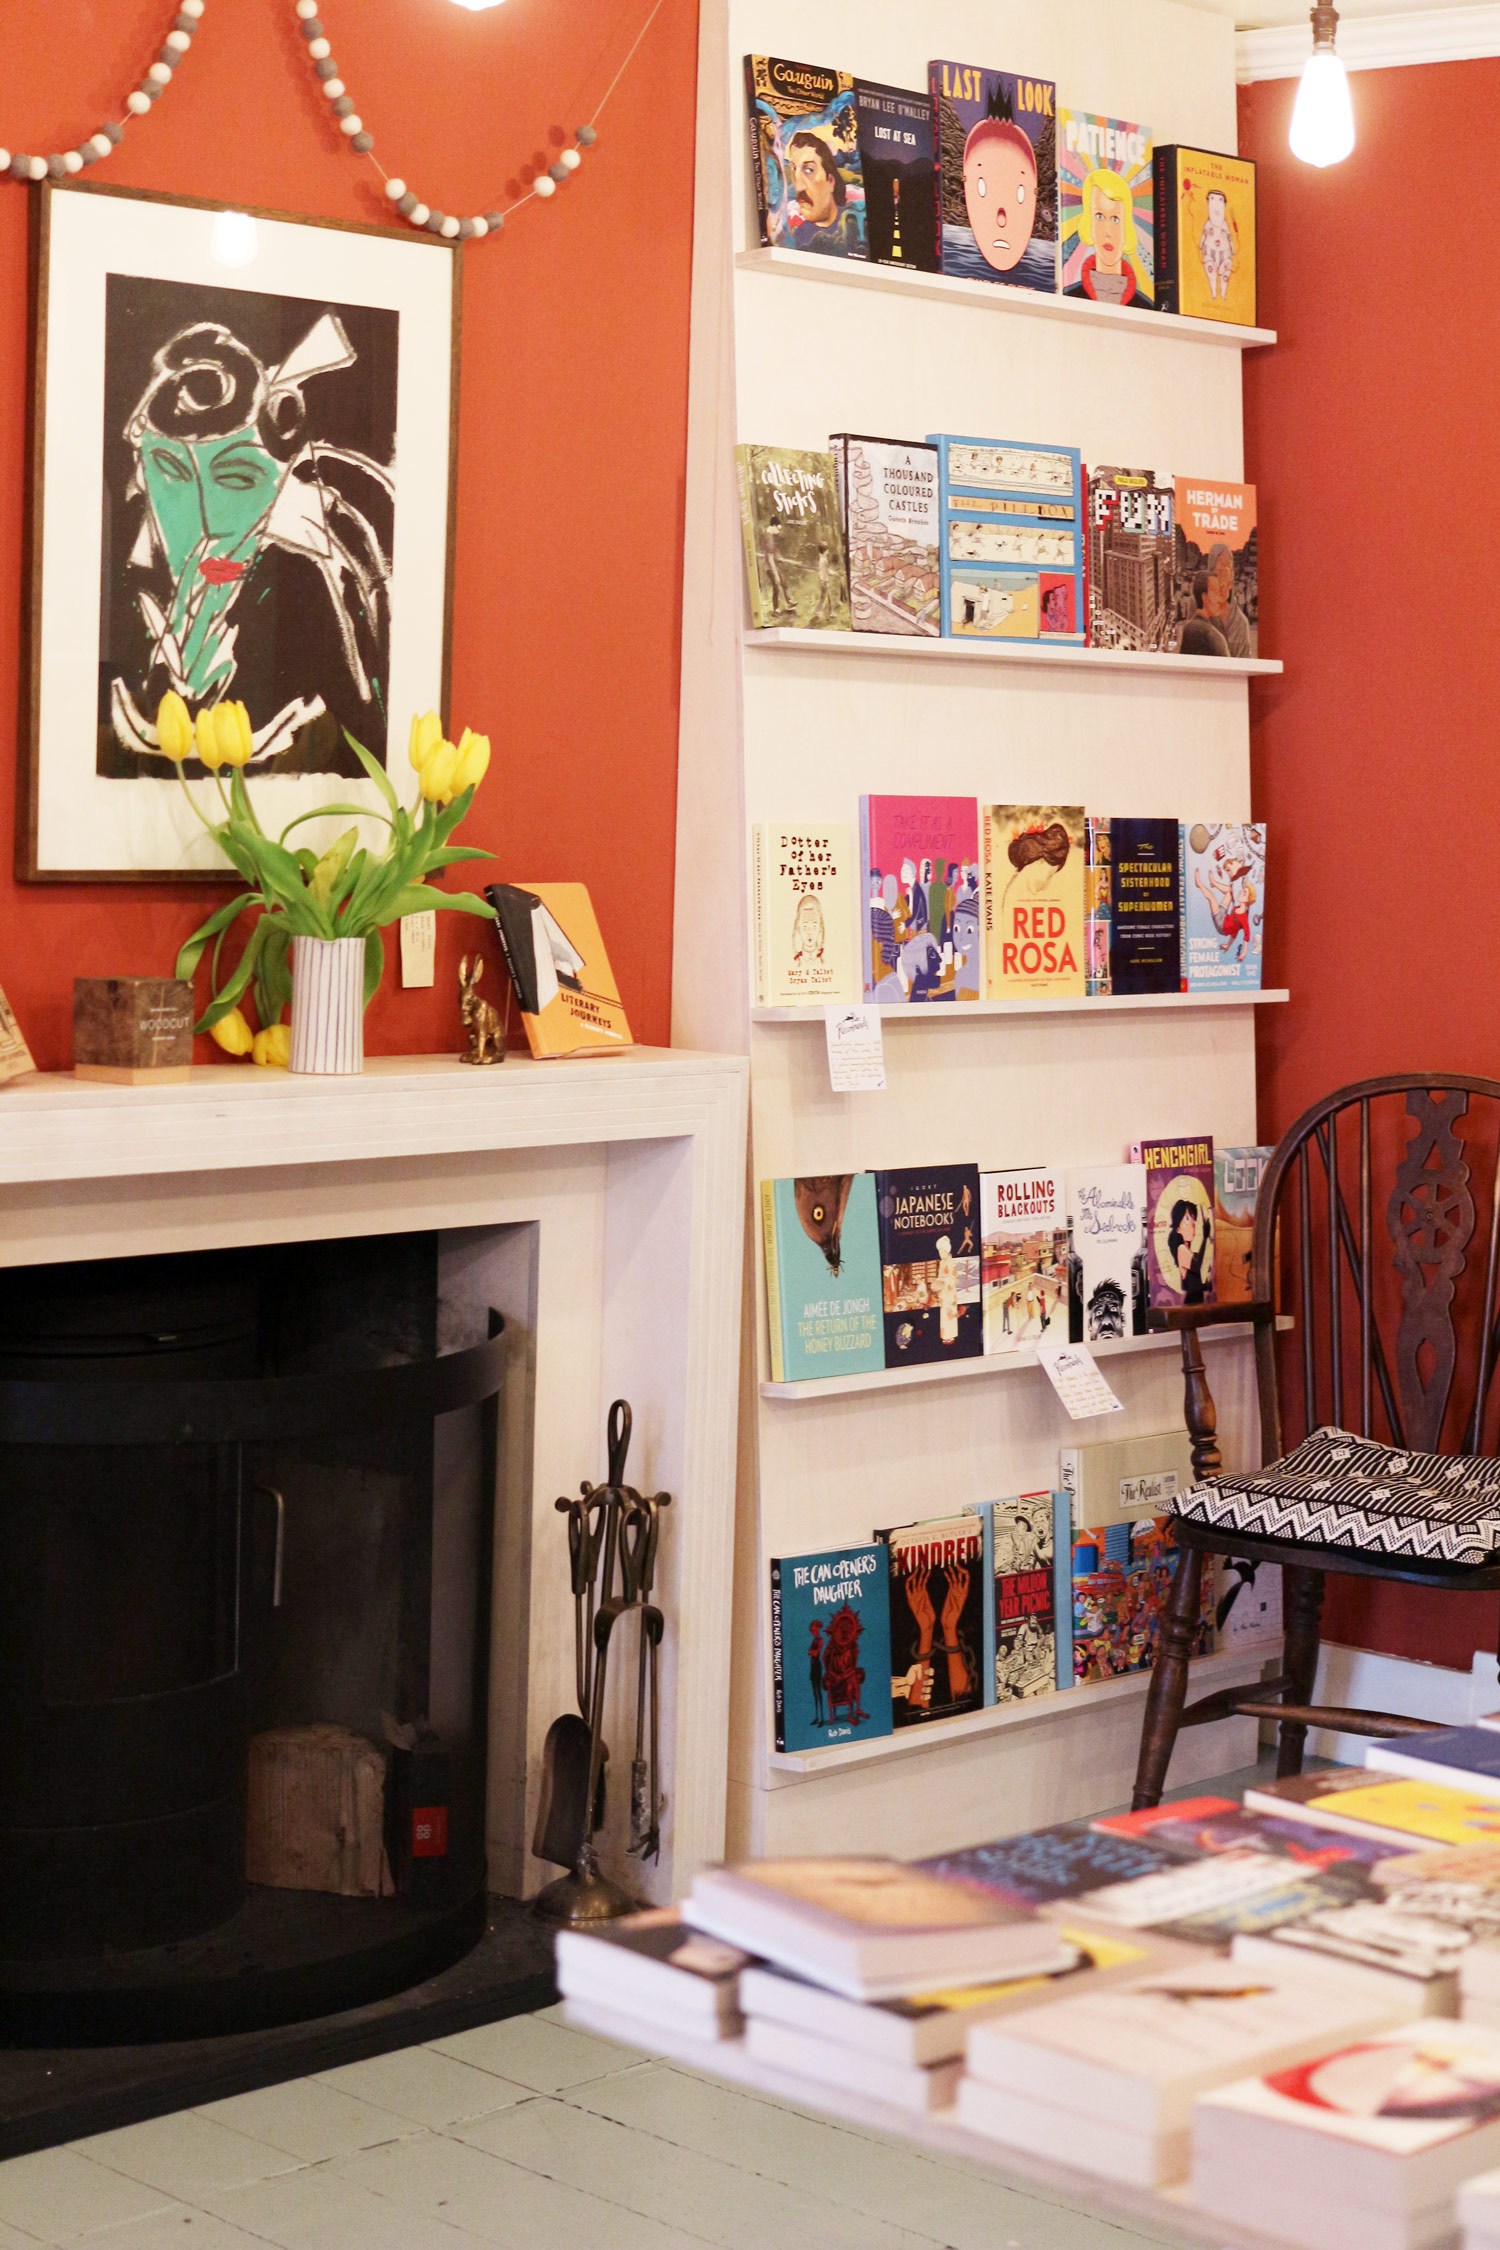 edinburgh-scotland-mercure-hotels-review-uk-travel-blogger-lifestyle-golden-hare-books-3